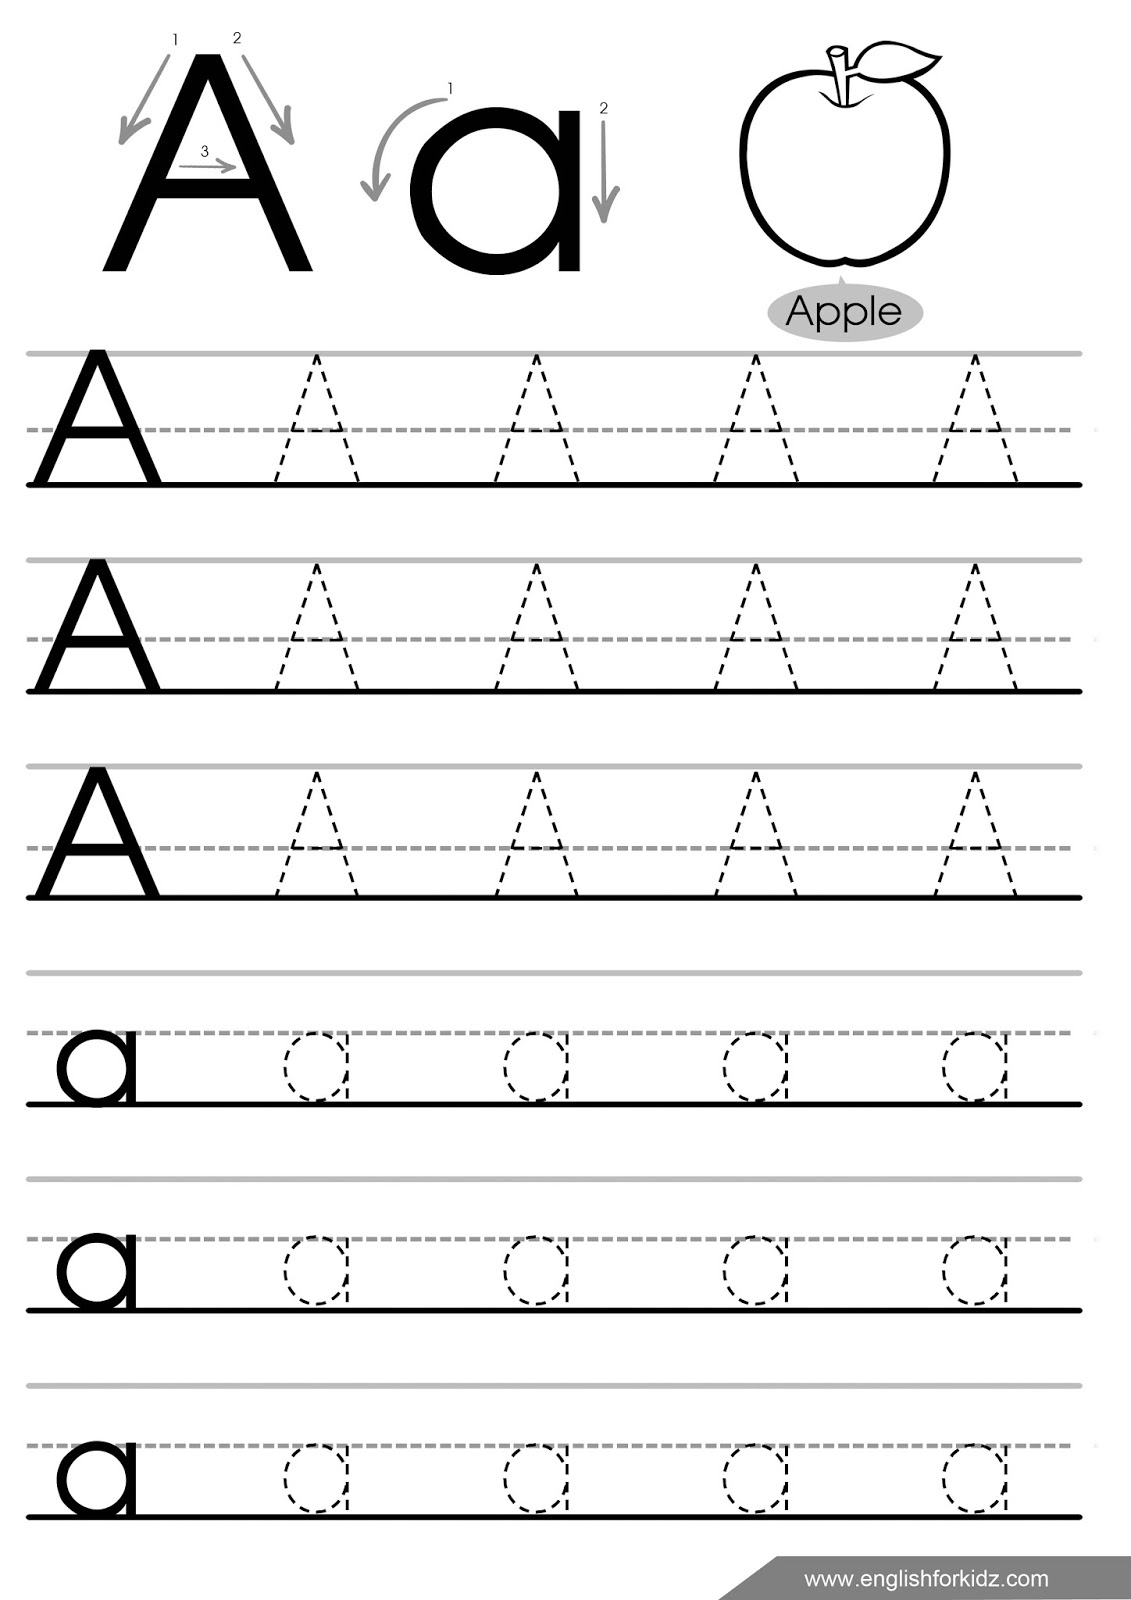 Letter Tracing Worksheets (Letters A - J) regarding Tracing Letter 1